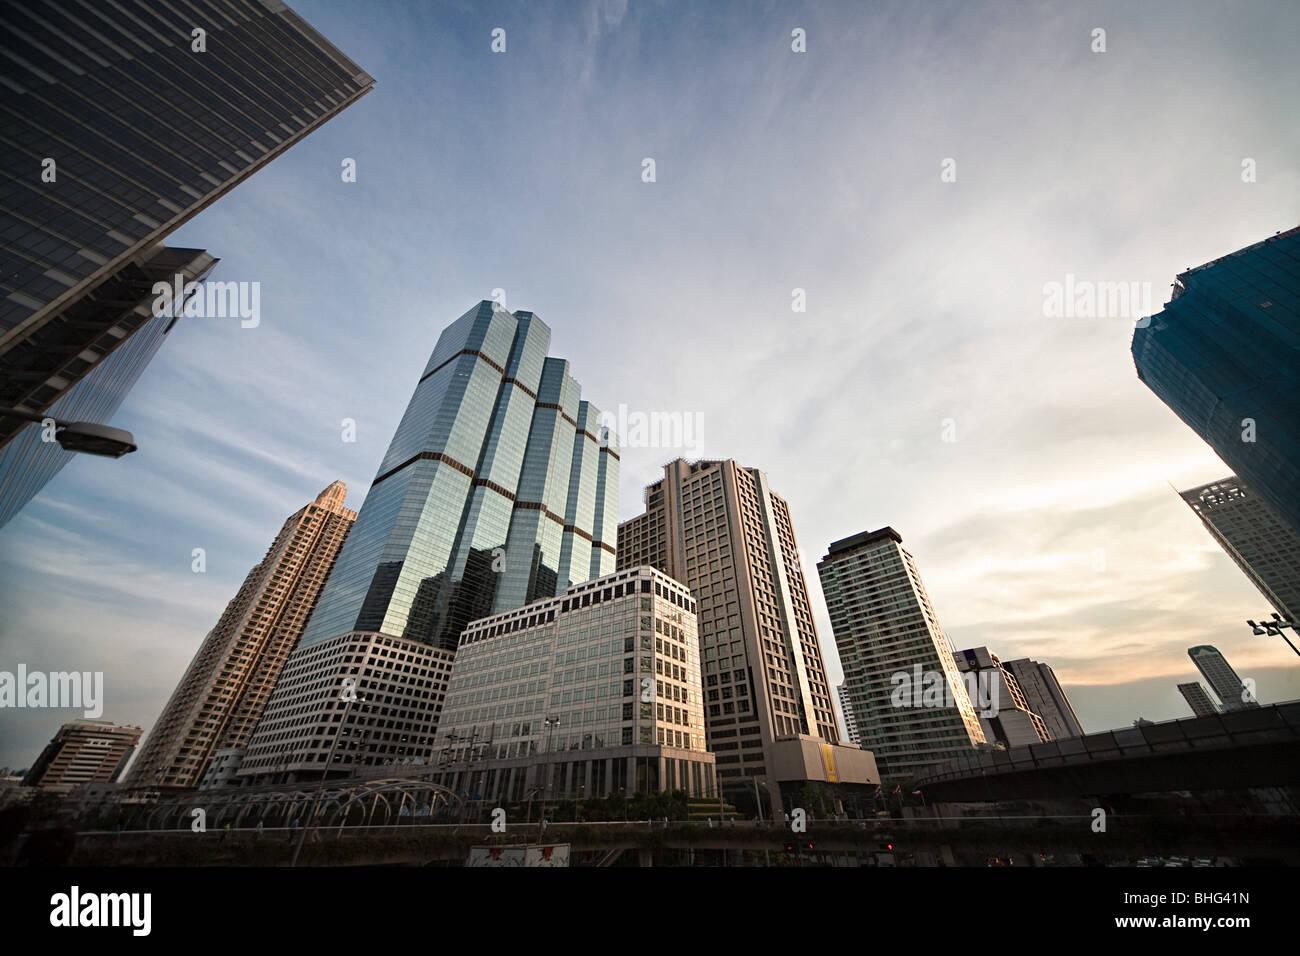 Central business district bangkok - Stock Image